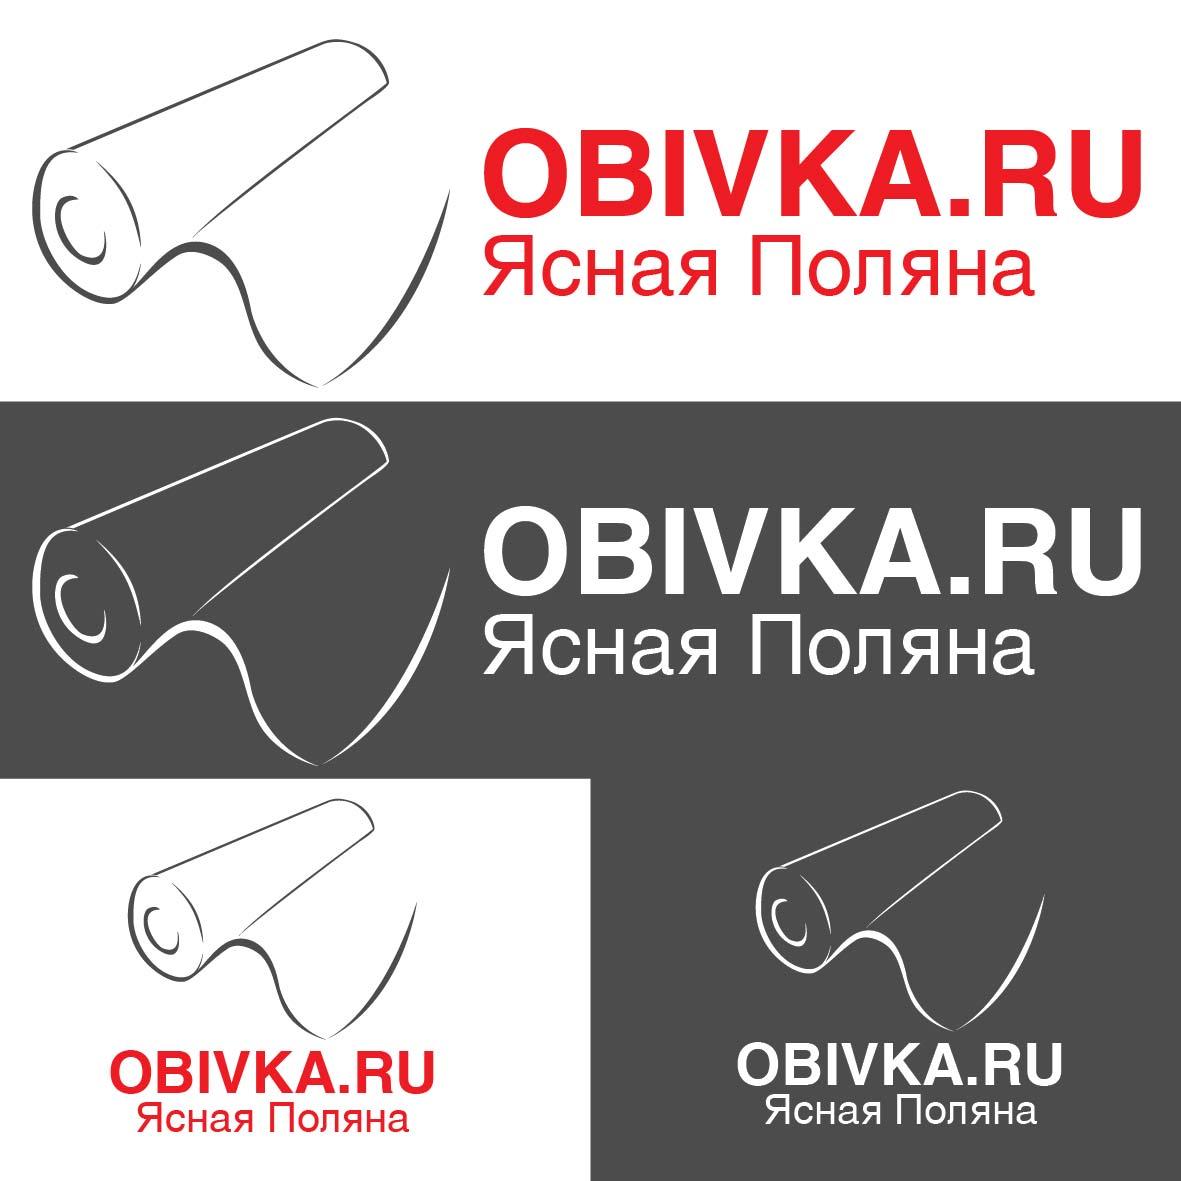 Логотип для сайта OBIVKA.RU фото f_0645c10fdc948370.jpg